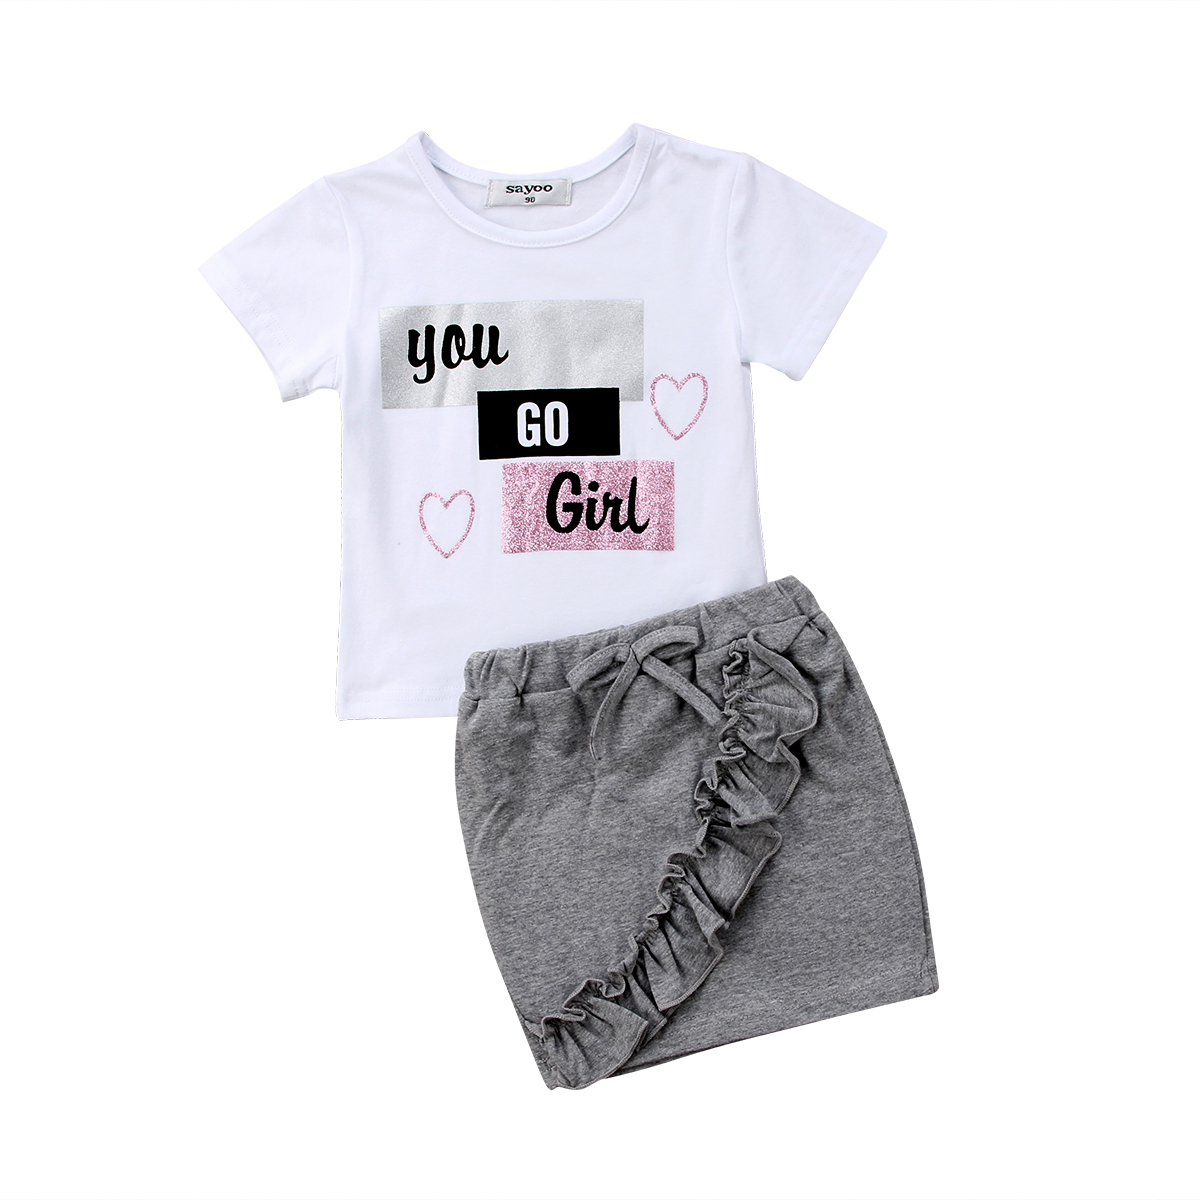 2019 New Summer Autumn Kid Baby Girls Cotton Tops T-shirt Short Skirts Dress Outfit Clothes Set